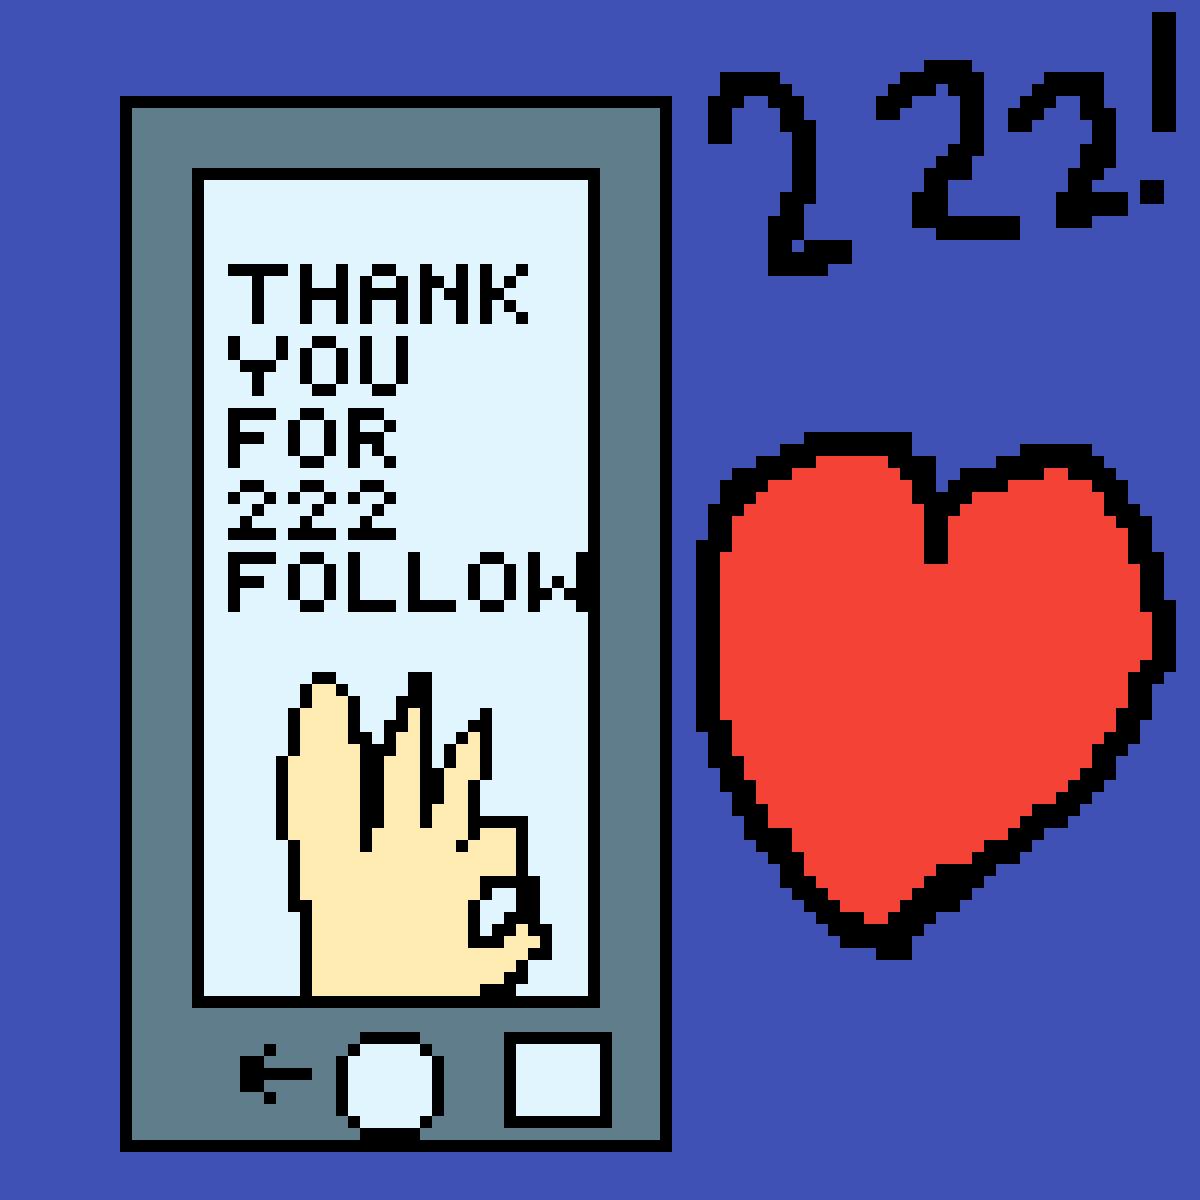 main-image-222 followers  by TinyFox925